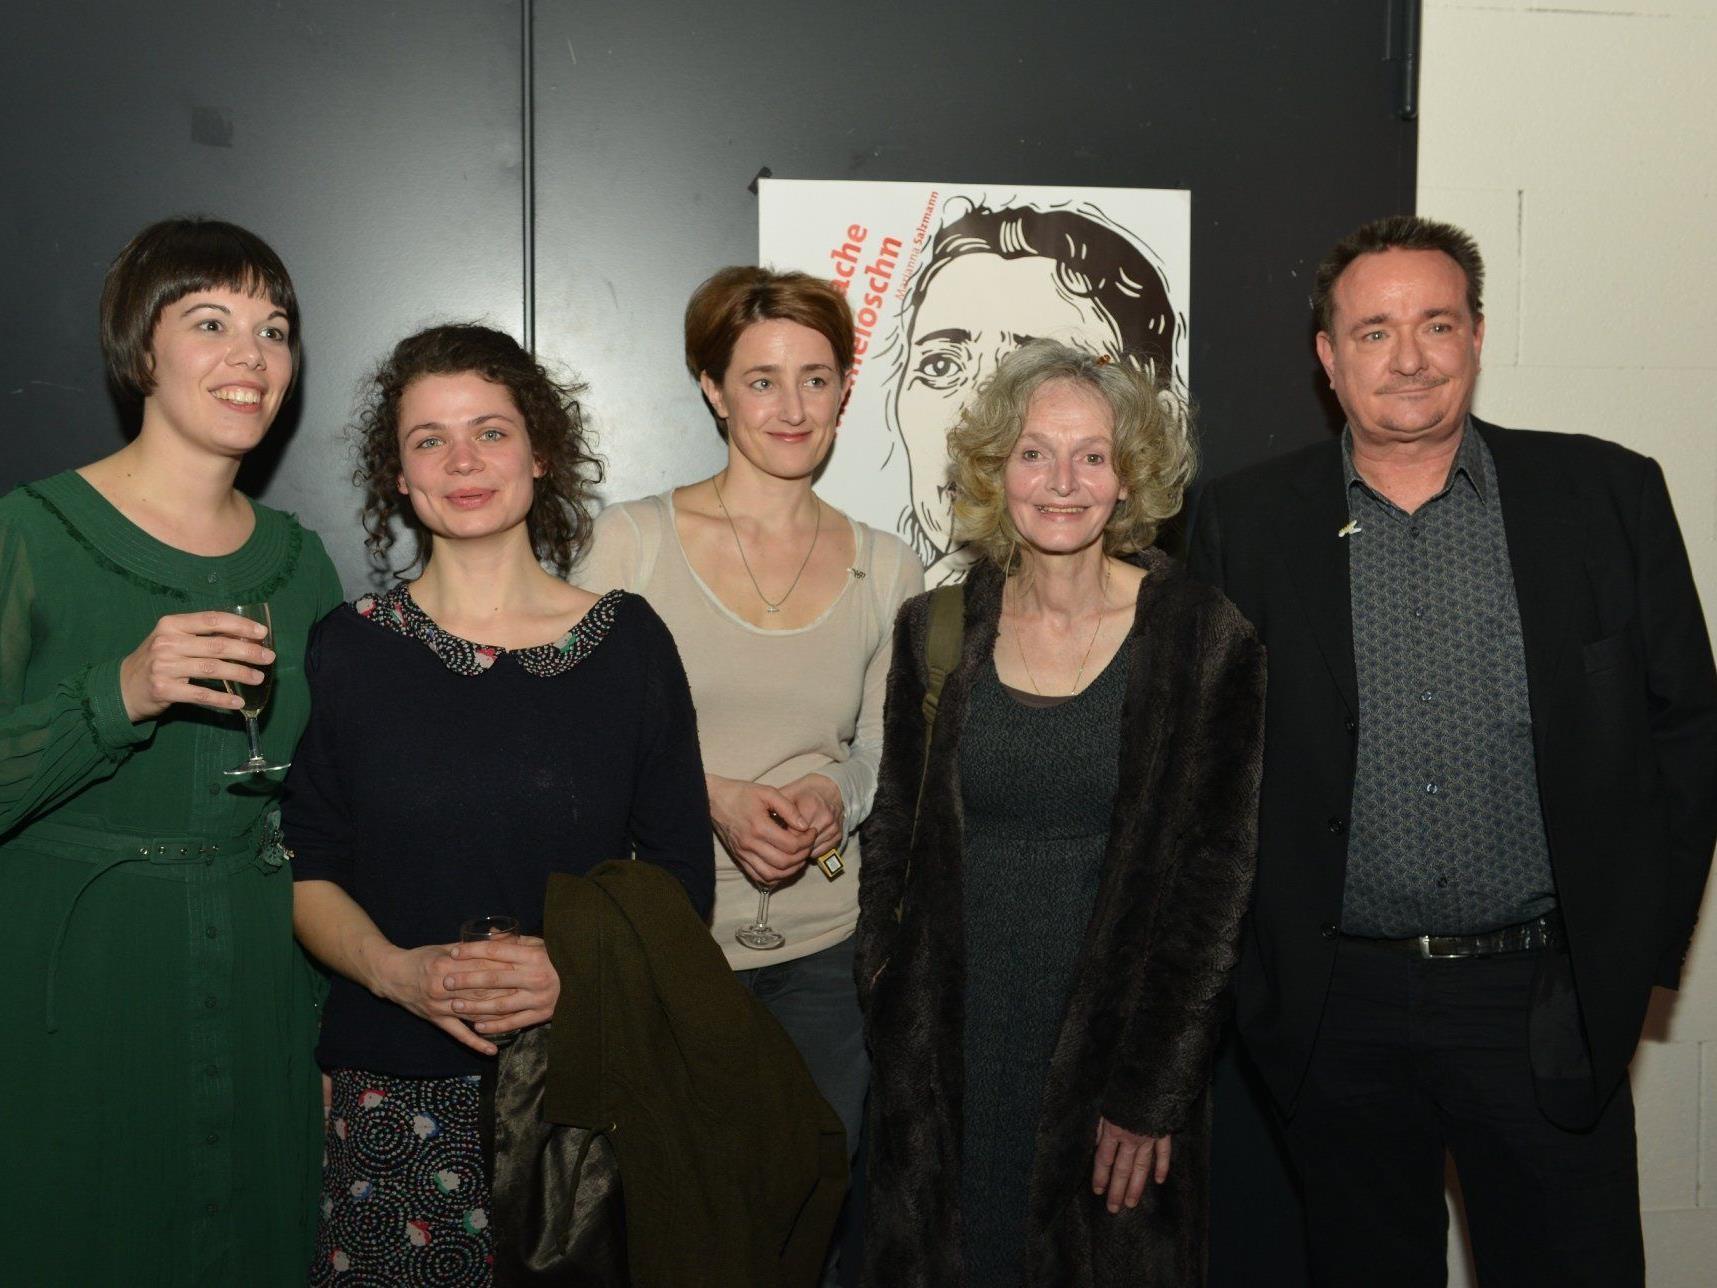 2) Barbara Schulte, Maria Perlick, Barbara Gassner, Juliane Gruner, Stefan Pfeistlinger